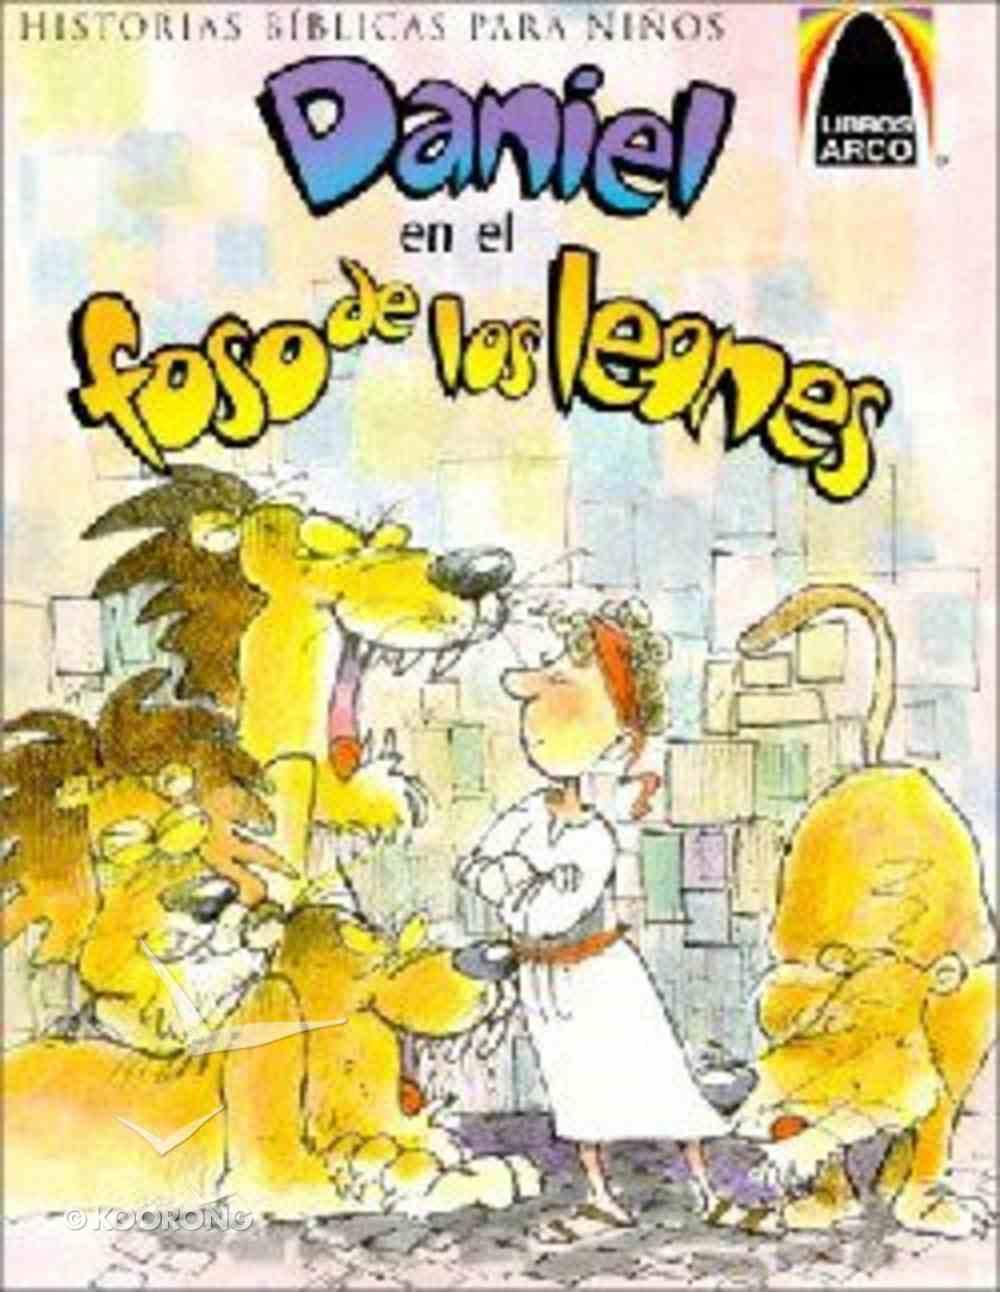 Daniel En El Fozo De Los Leones (Daniel and the Roaring Lions) (Spanish Arch Books Series) Paperback